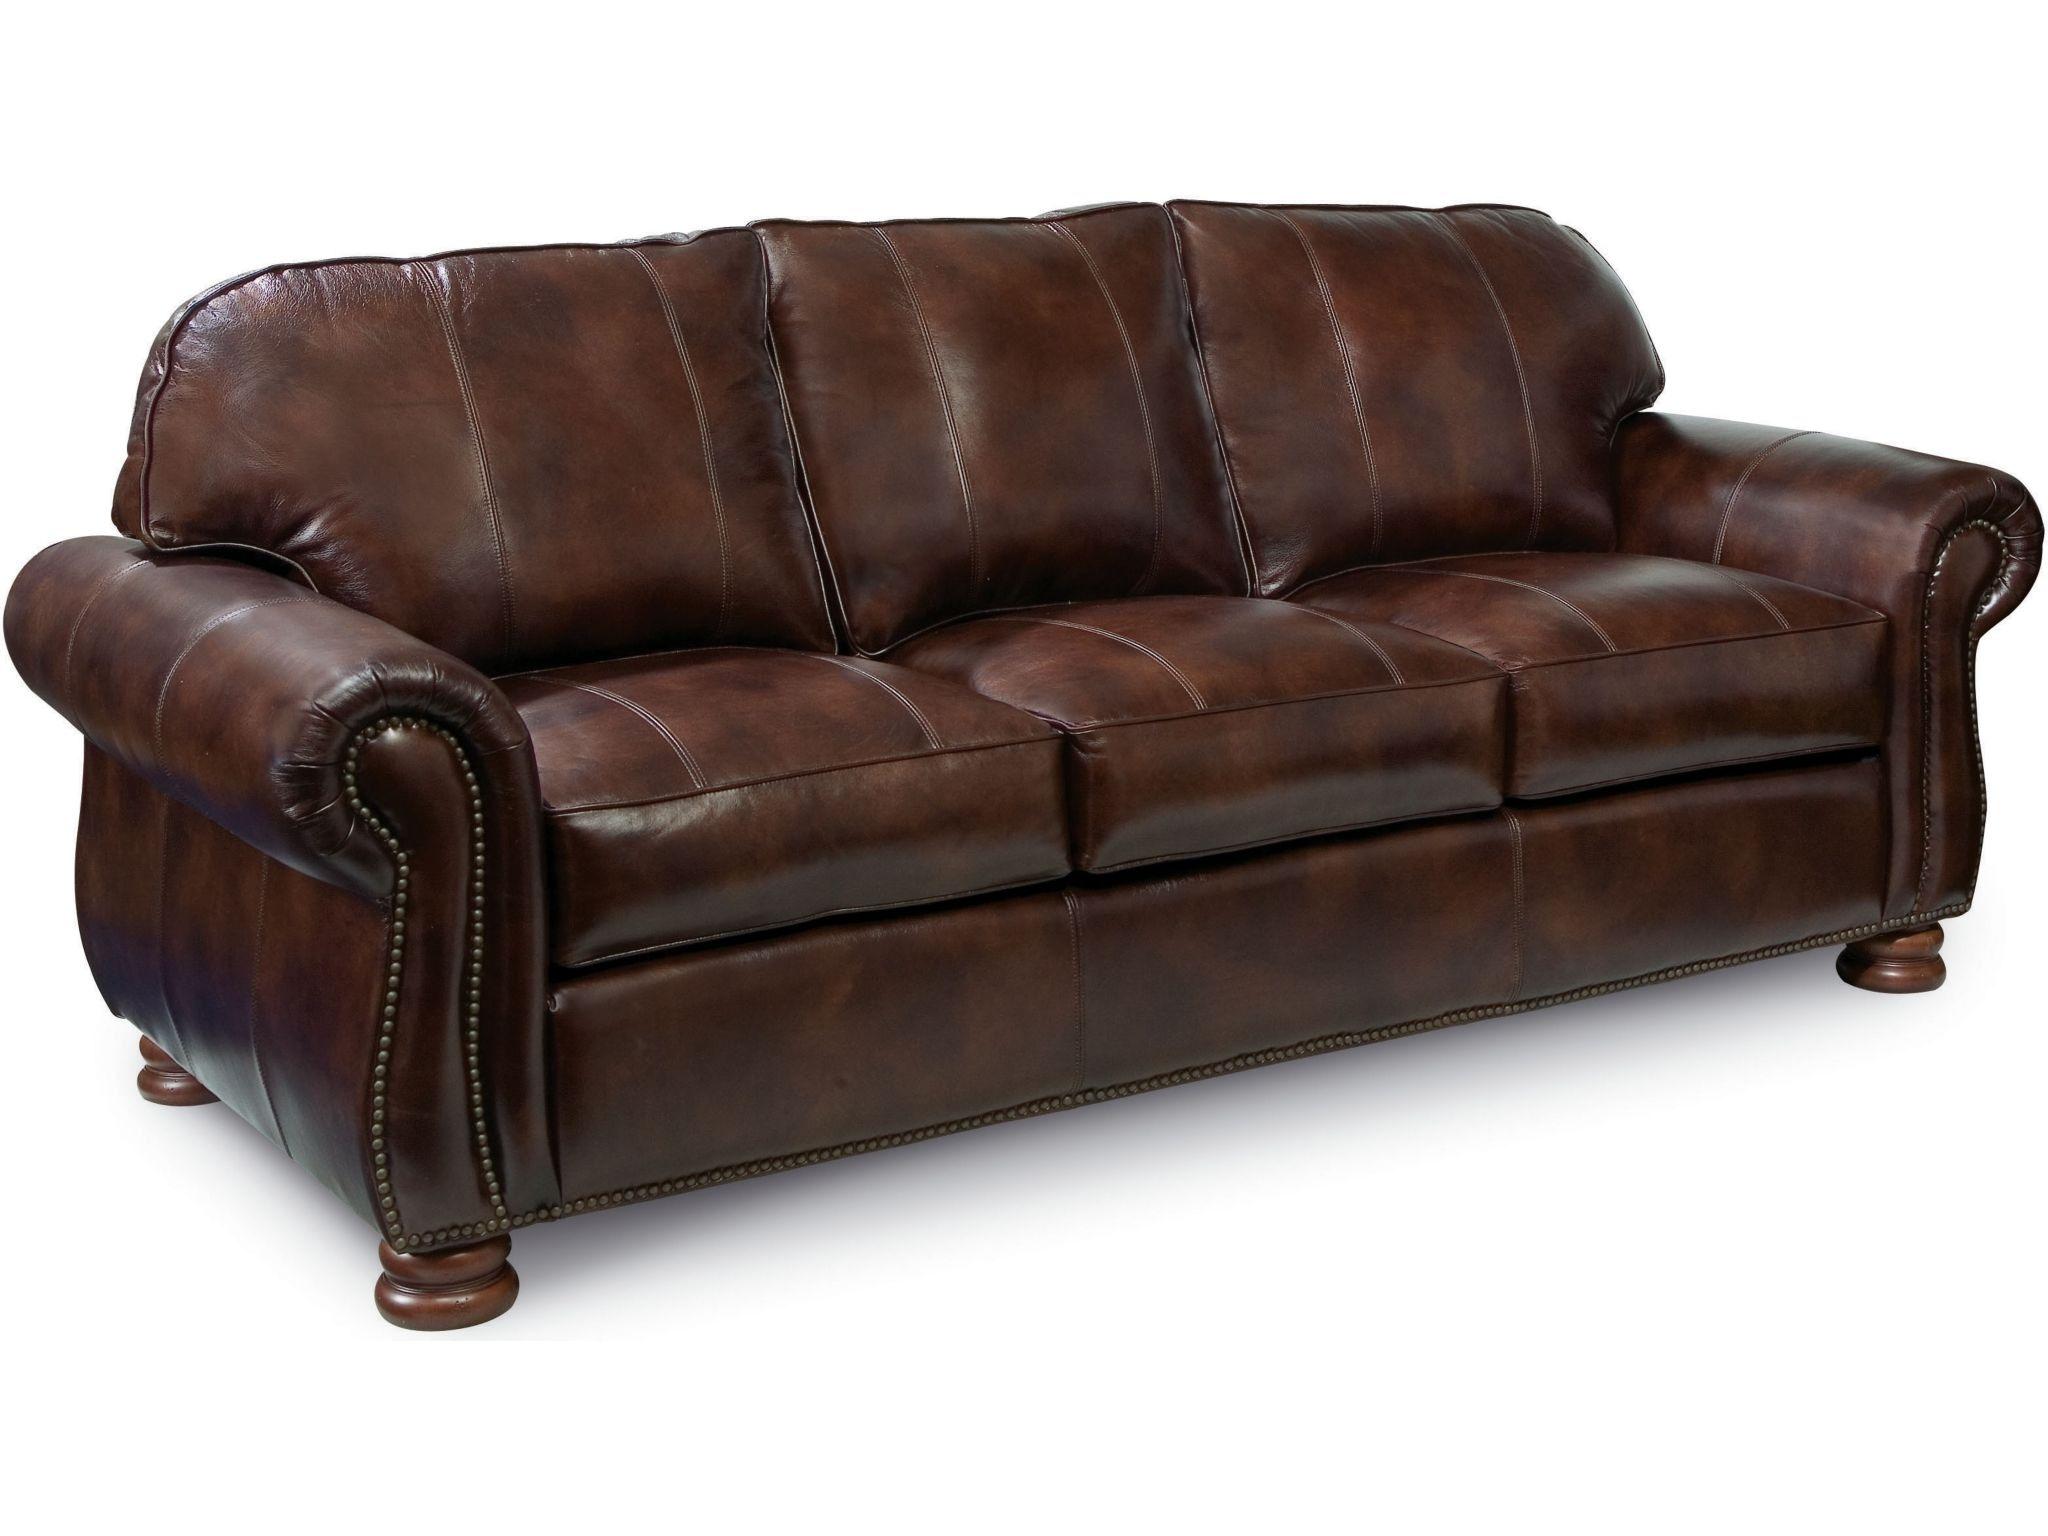 Great Thomasville Benjamin 3 Seat Sofa HS1461 31E